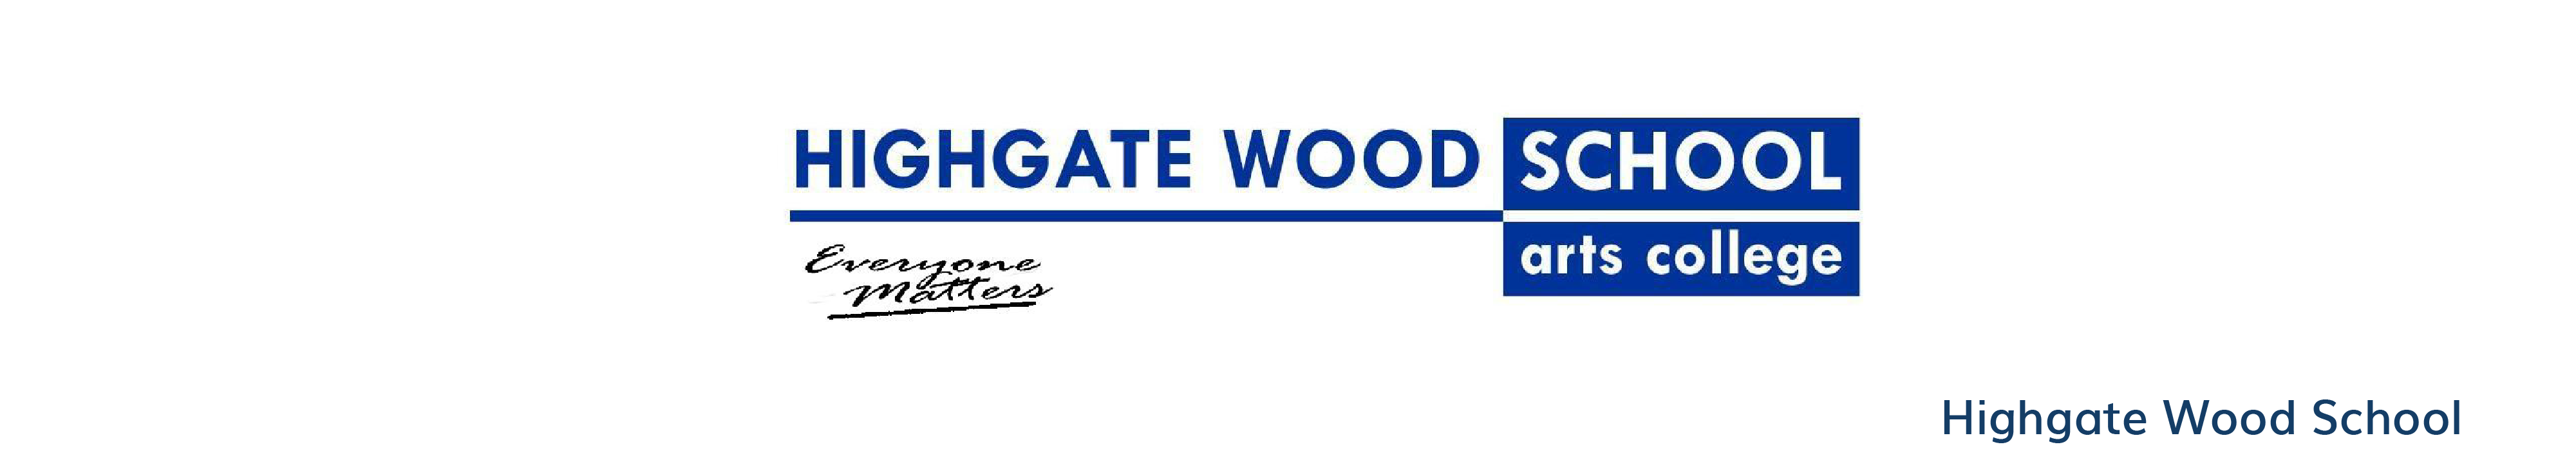 Highgate Wood School arts college